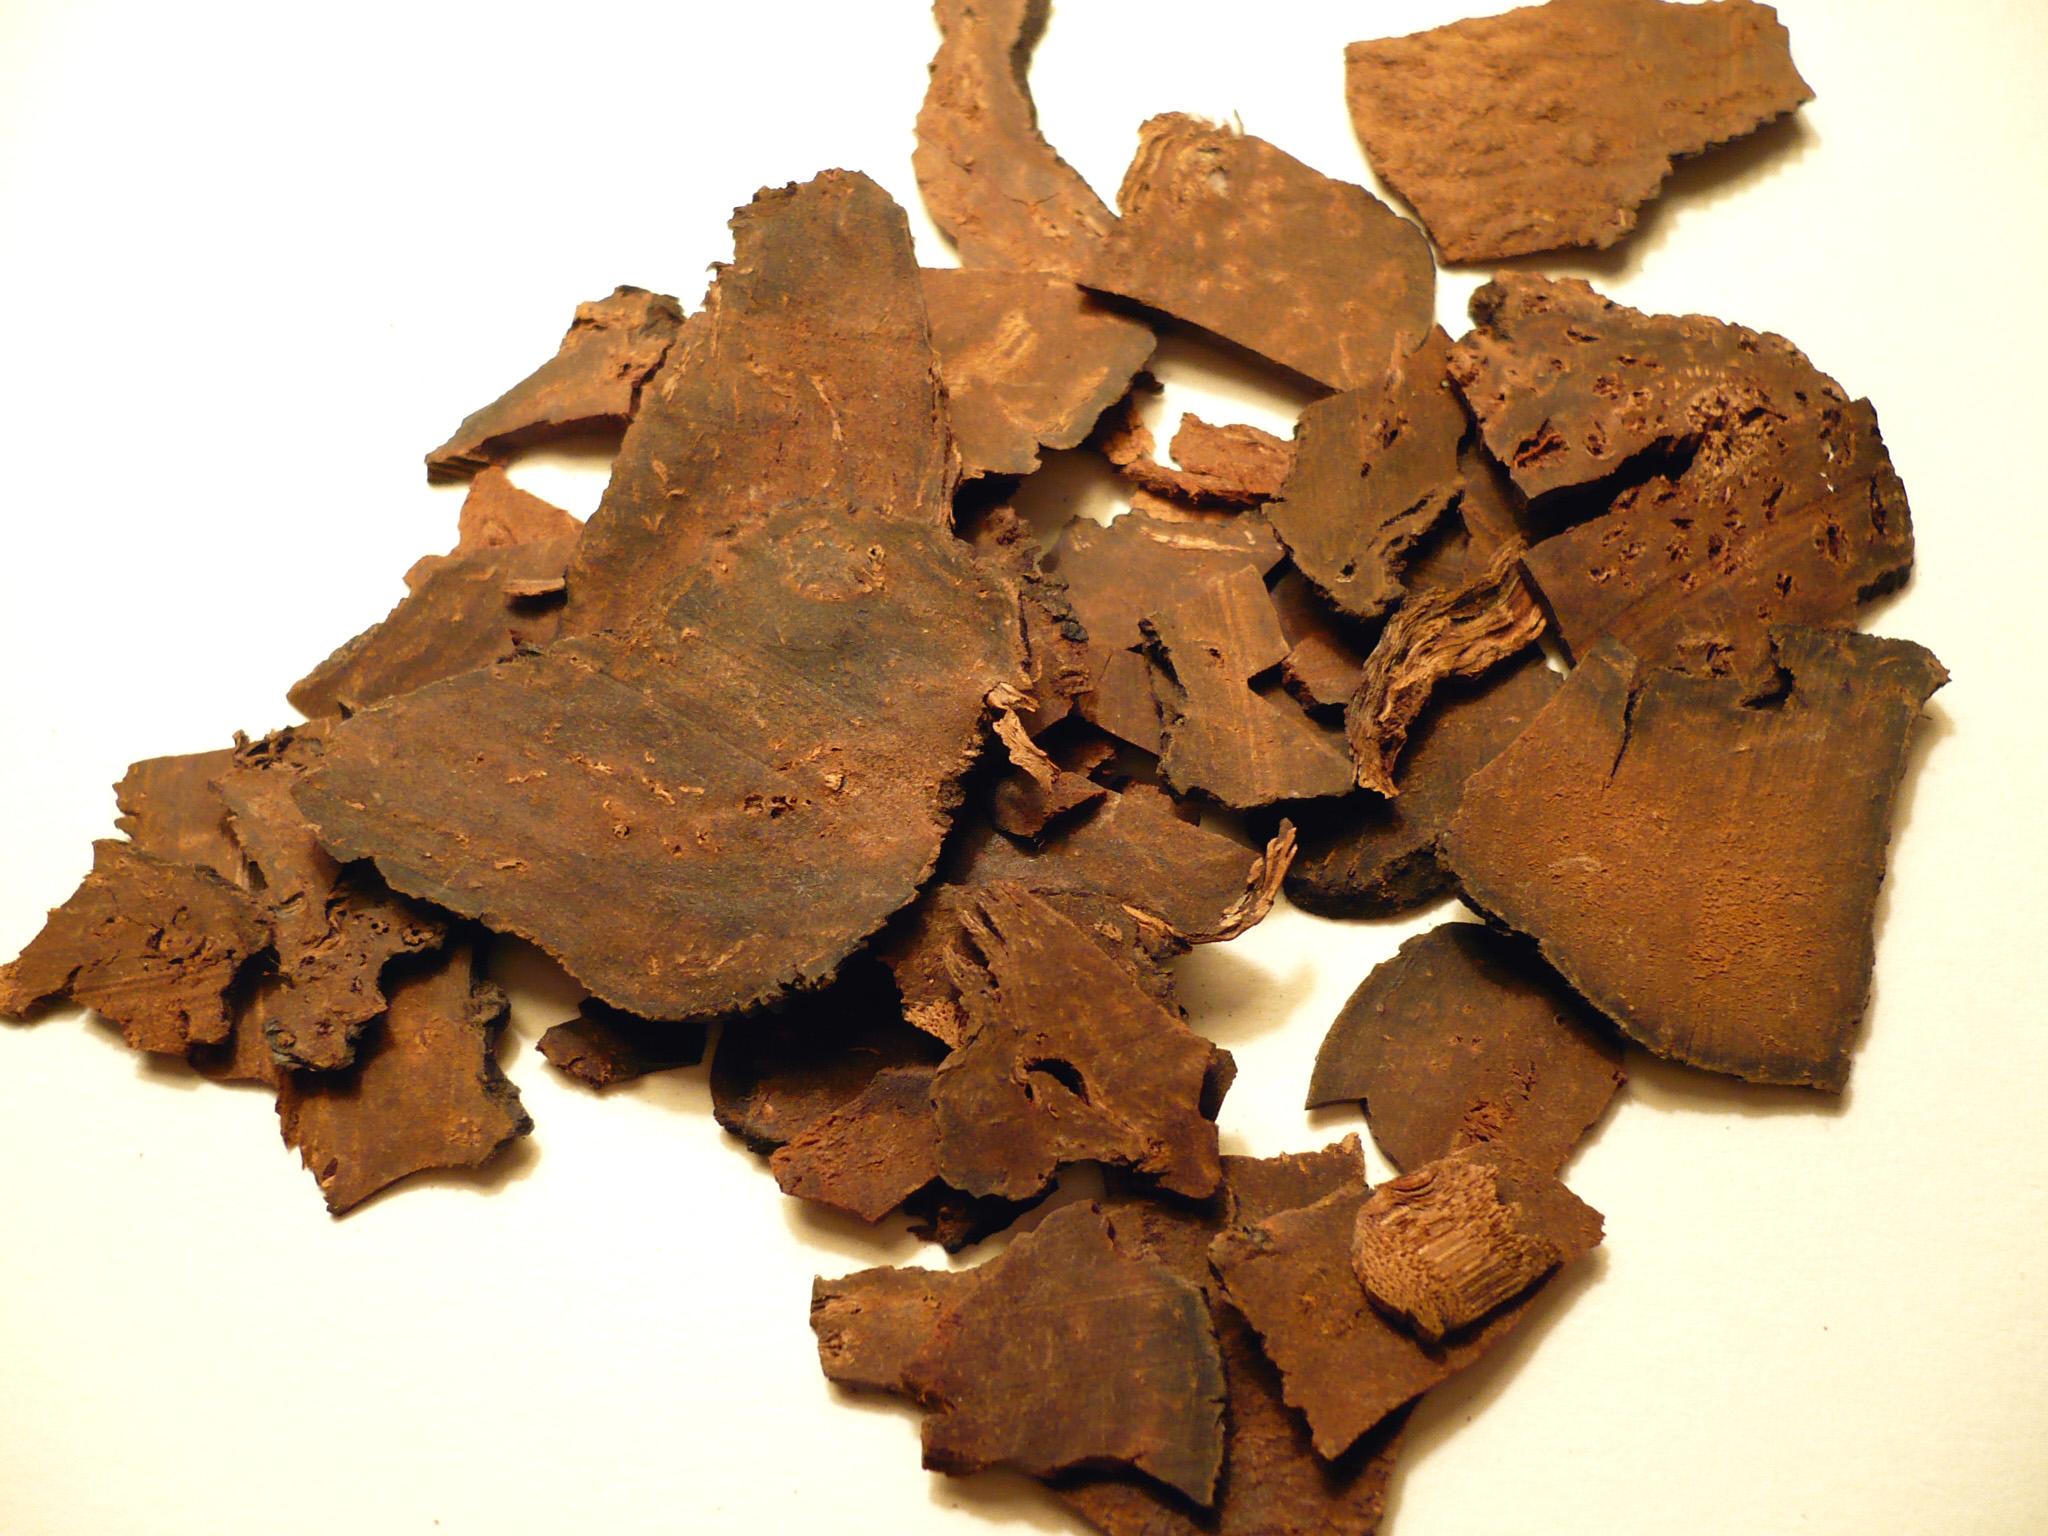 File:Polygonummultiflorumrootdried.jpg - Wikimedia Commons